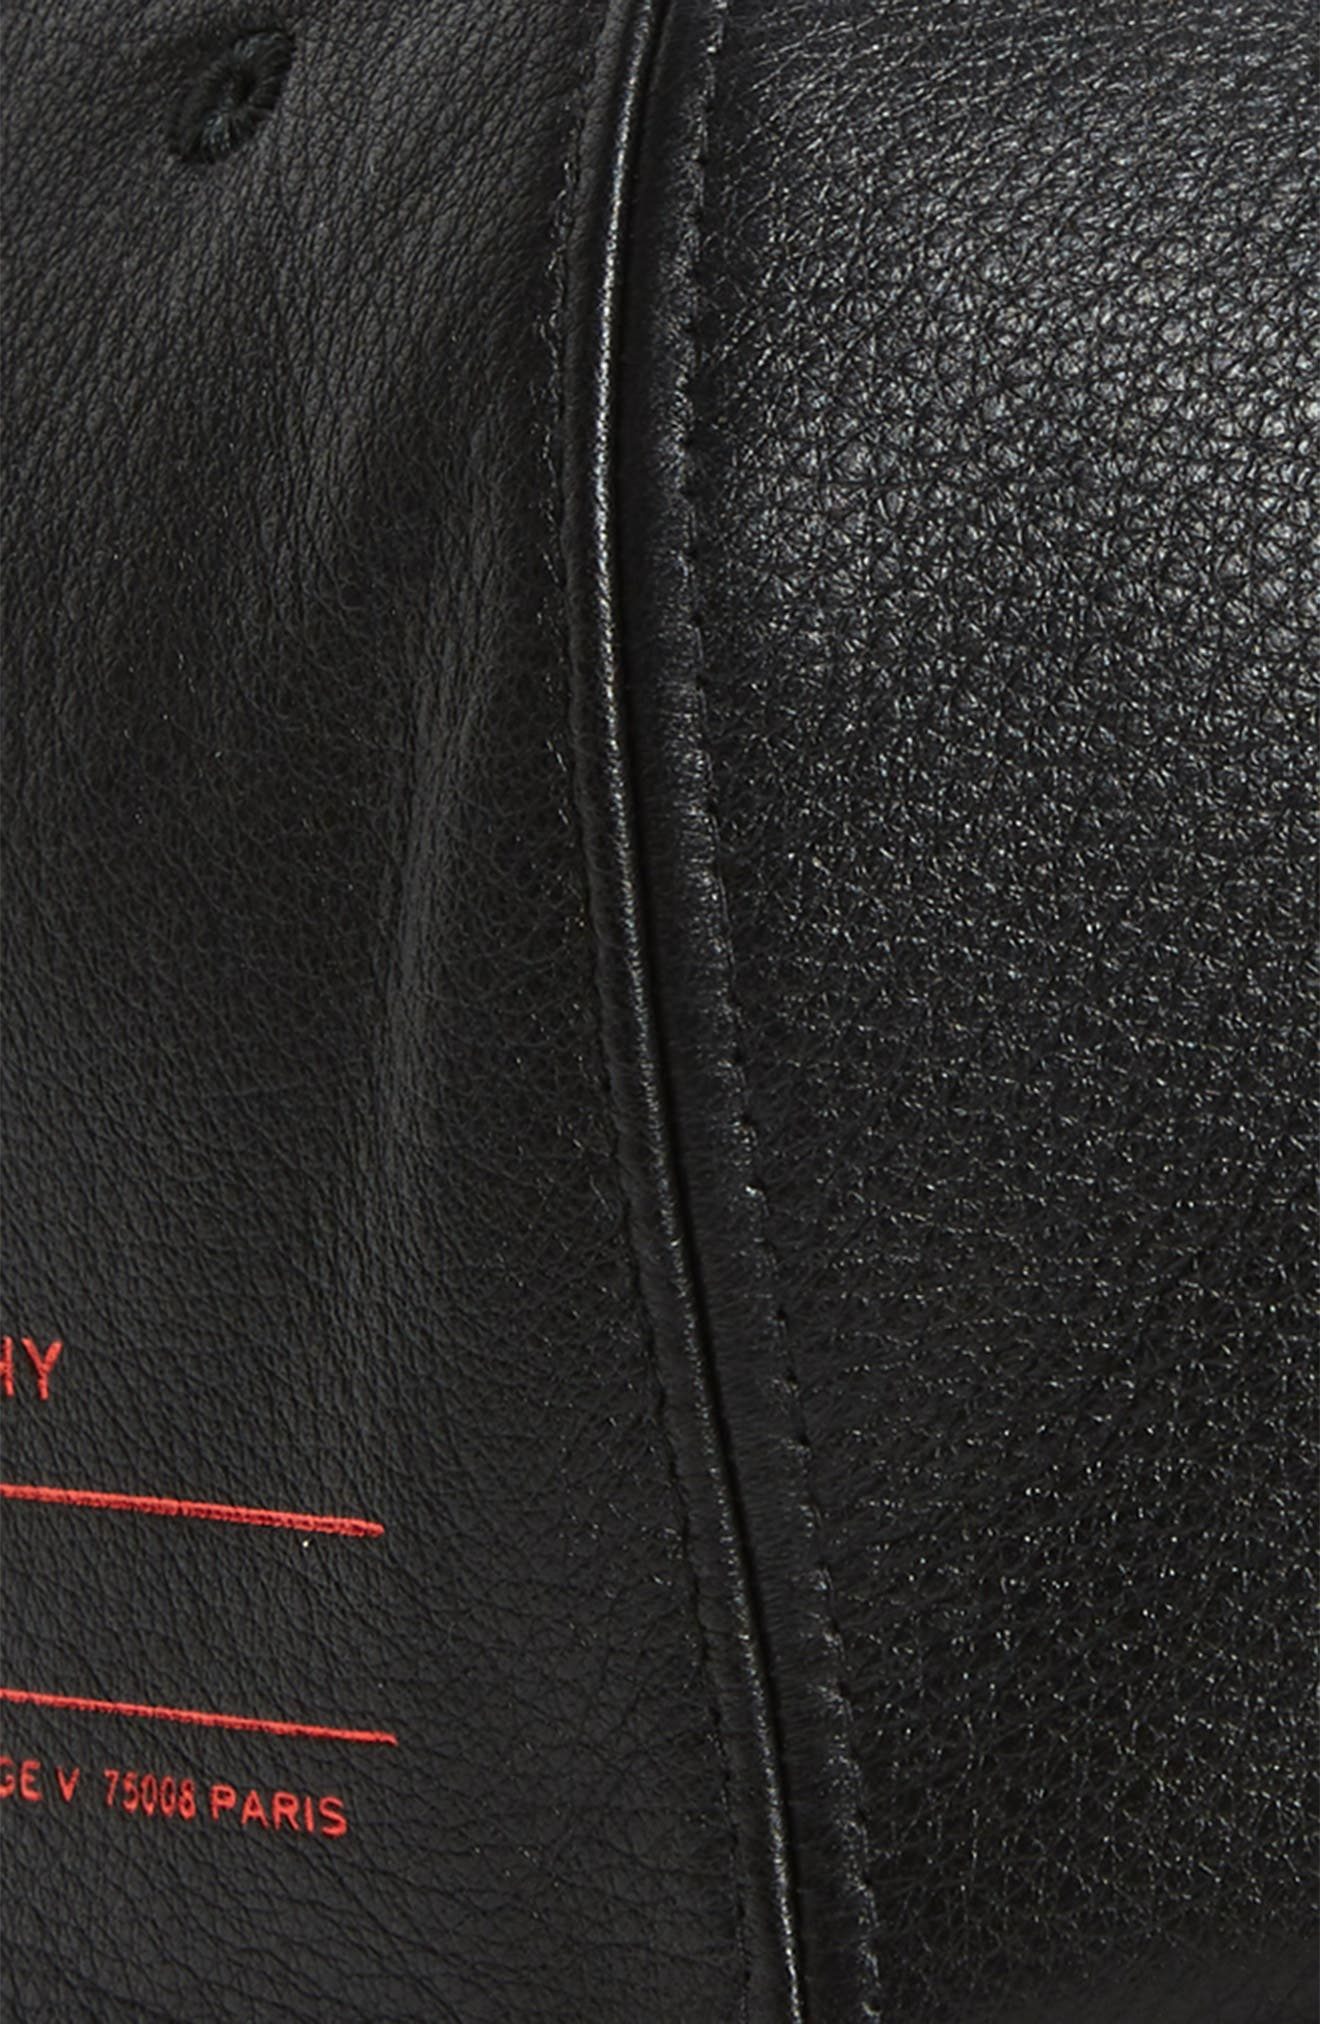 Leather Ball Cap,                             Alternate thumbnail 3, color,                             Black/ White